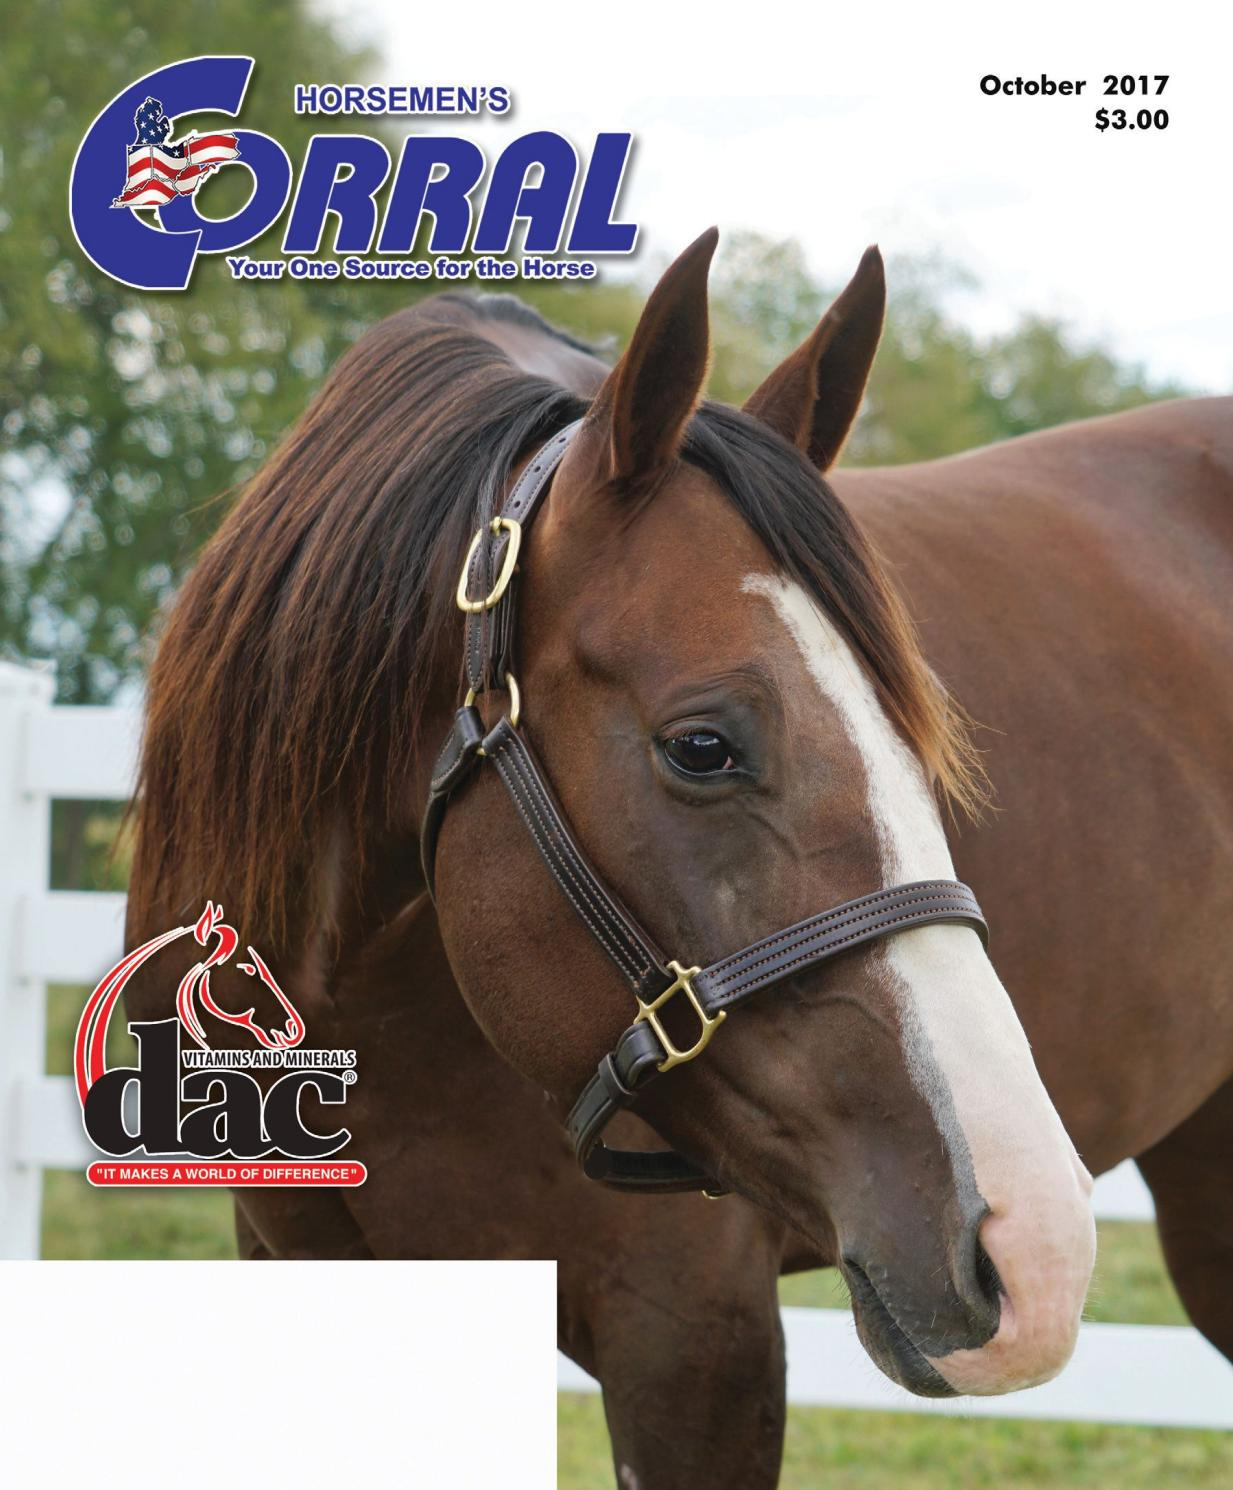 Horsemen's Corral October 2017 by Horsemen's Corral - issuu